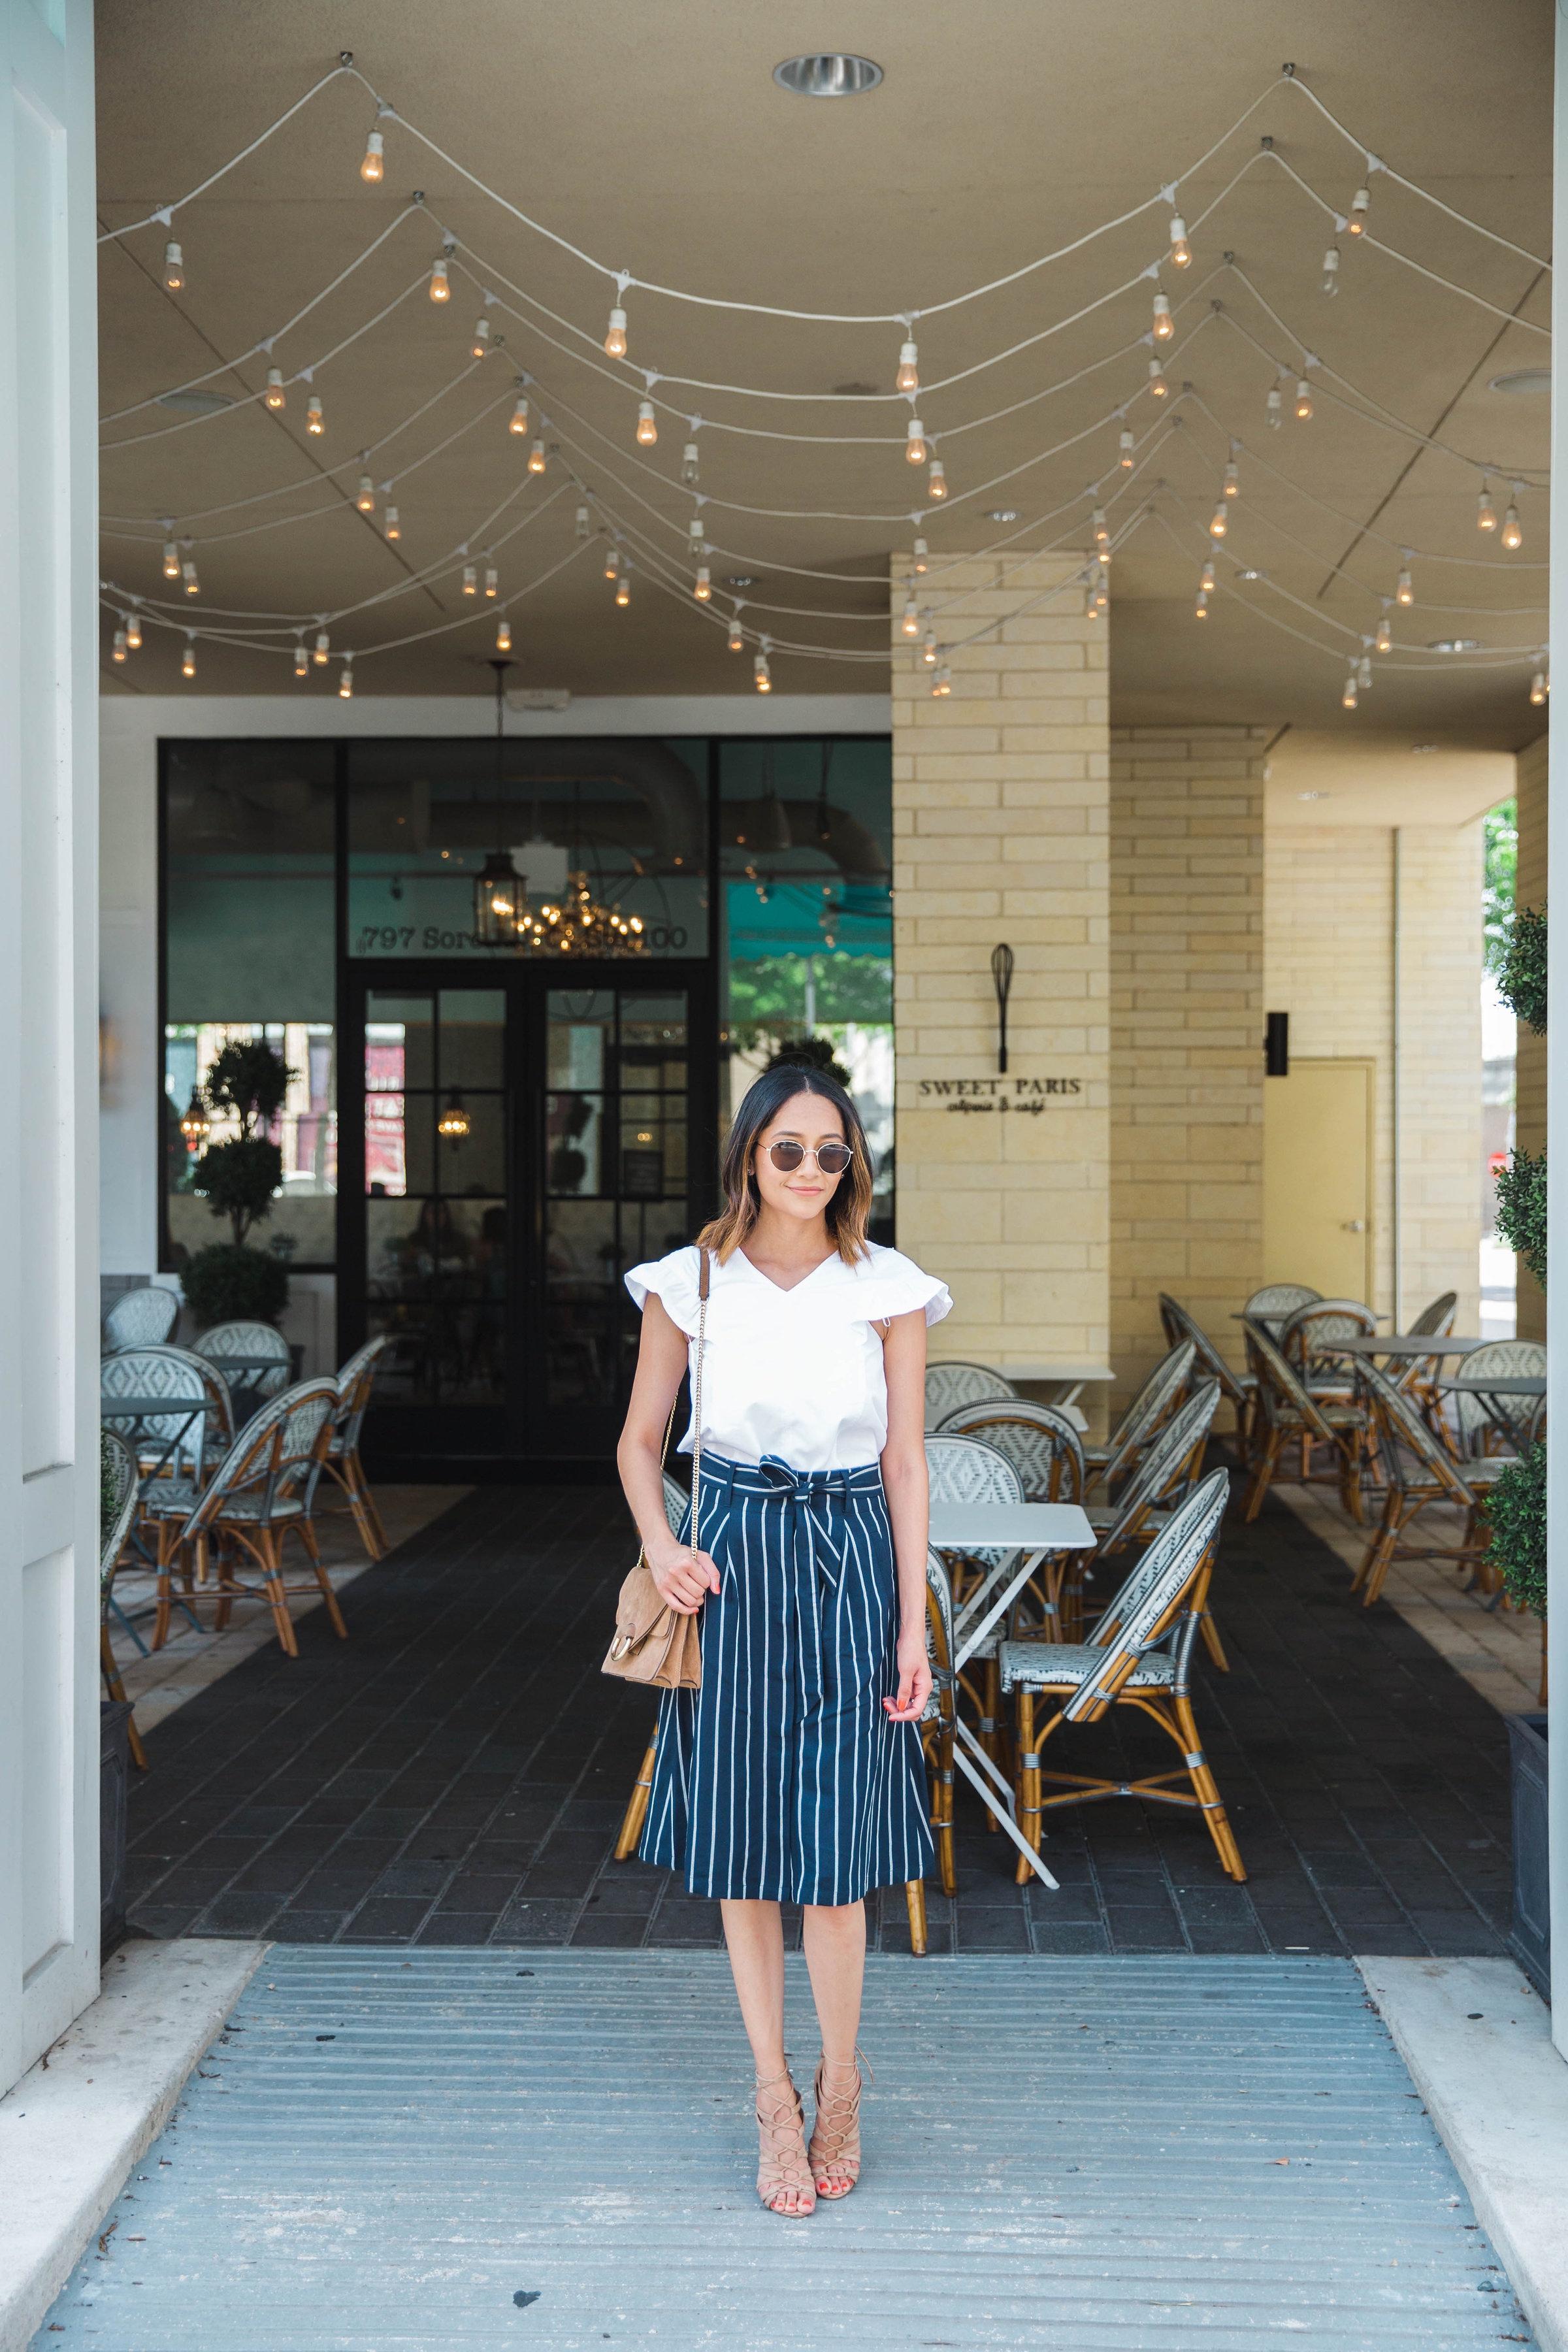 Ruffle Sleeves | A Line Skirt | Summer Look | Date Night Look